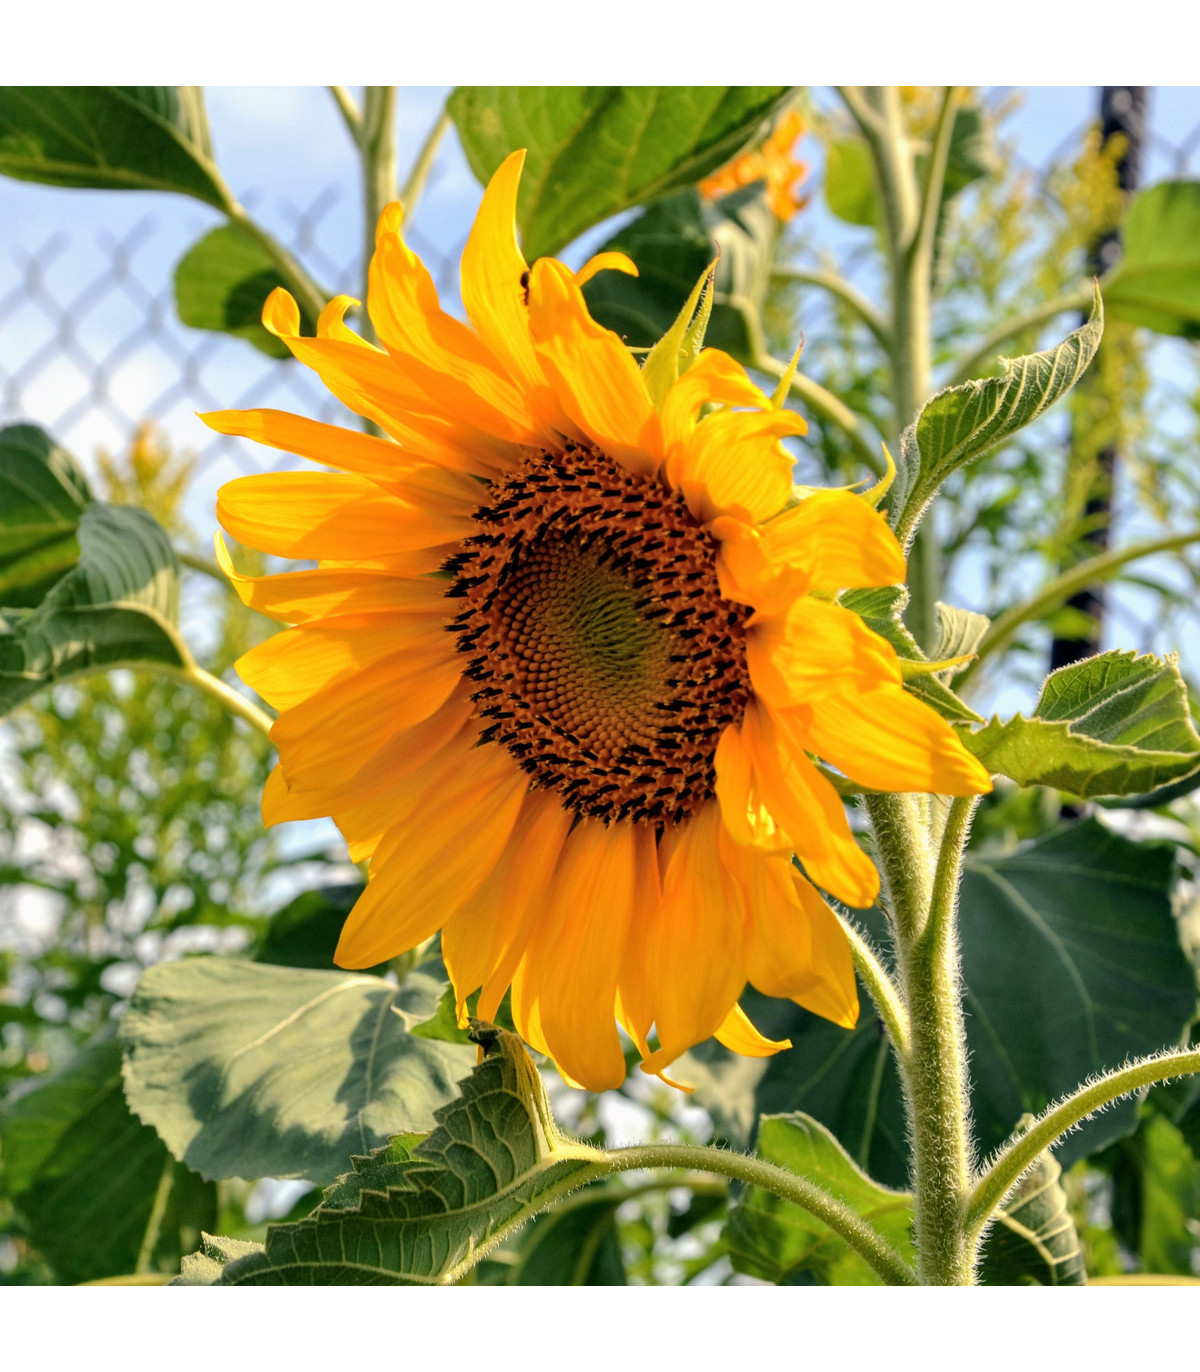 Slnečnica Topolino - semená slnečnice - Helianthus annuus - 7 ks